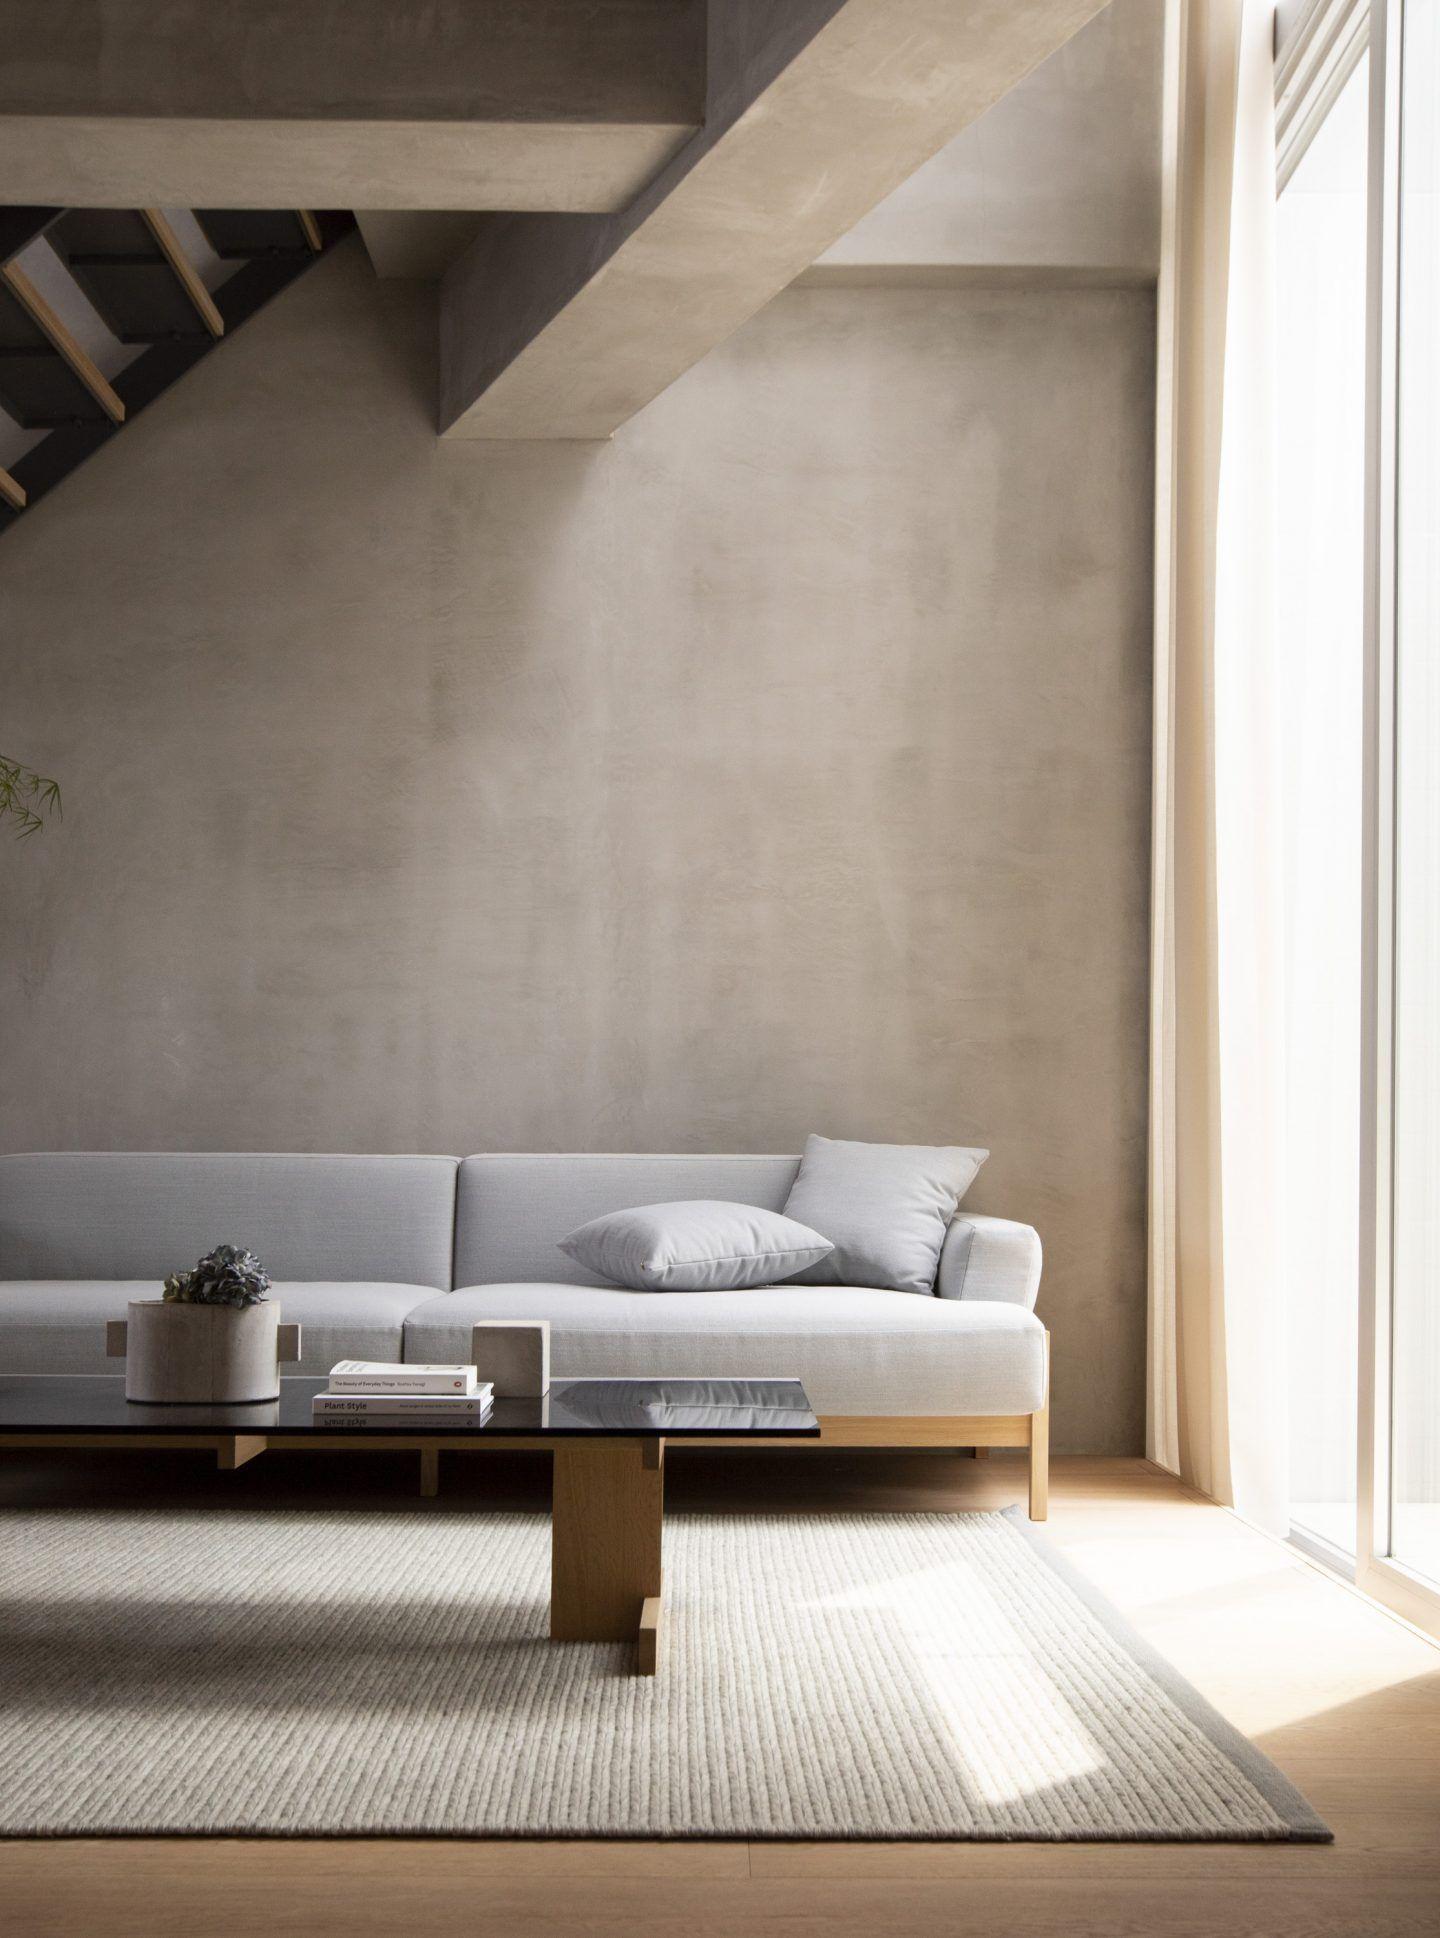 IGNANT-Design-Norm-Architects-Kinuta-Terrace-05